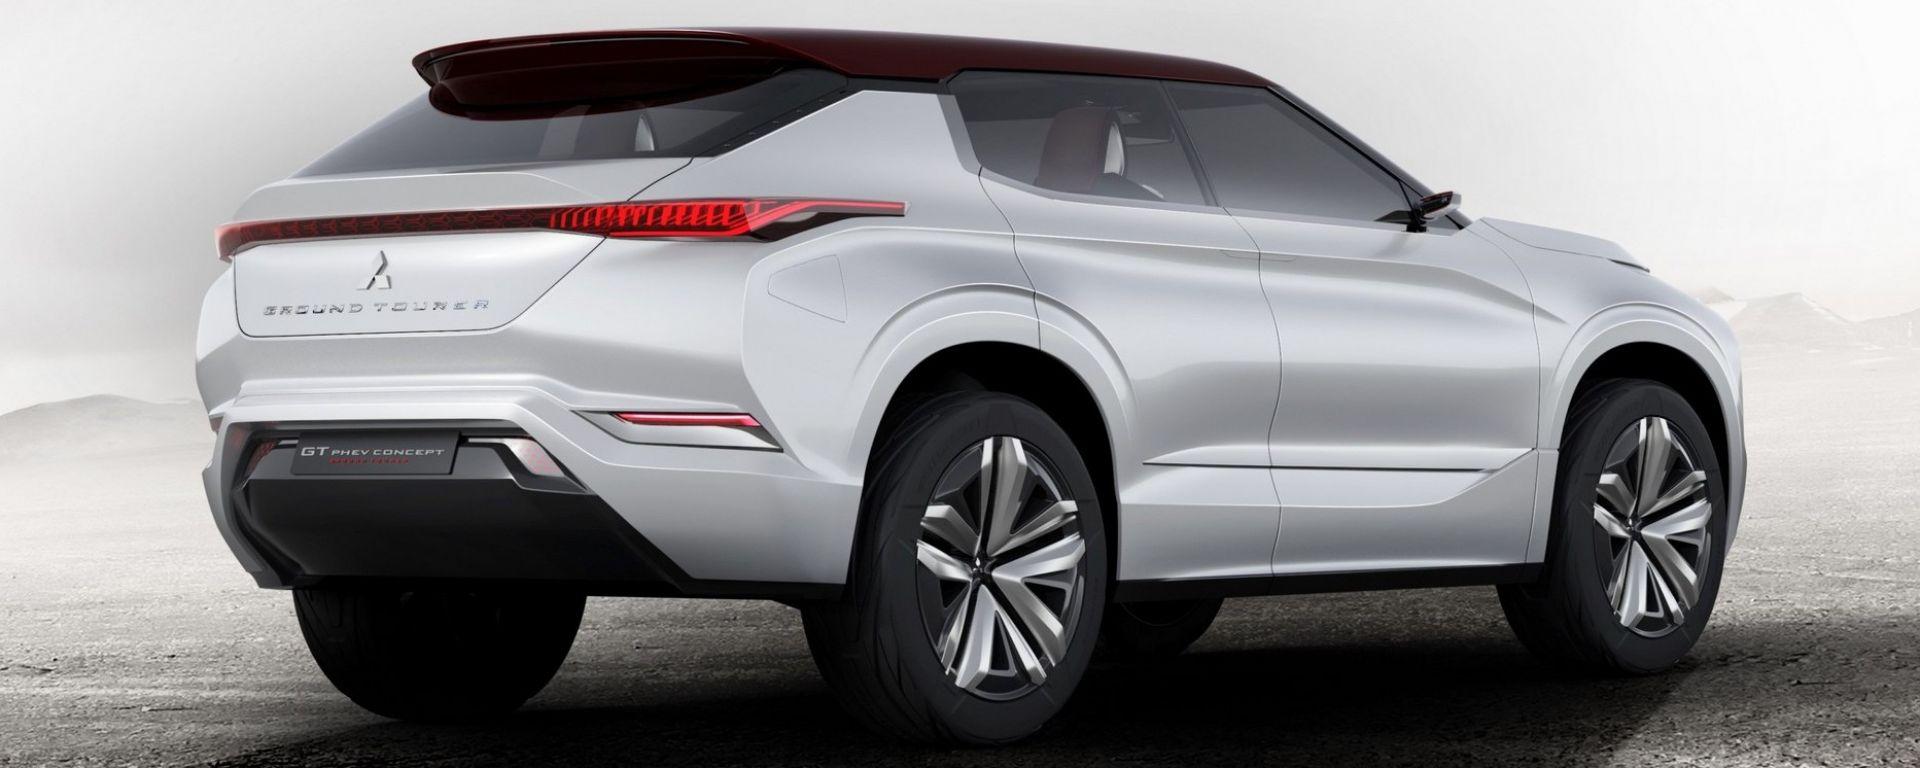 Mitsubishi GT-PHEV Concept: un suv ibrido per Parigi